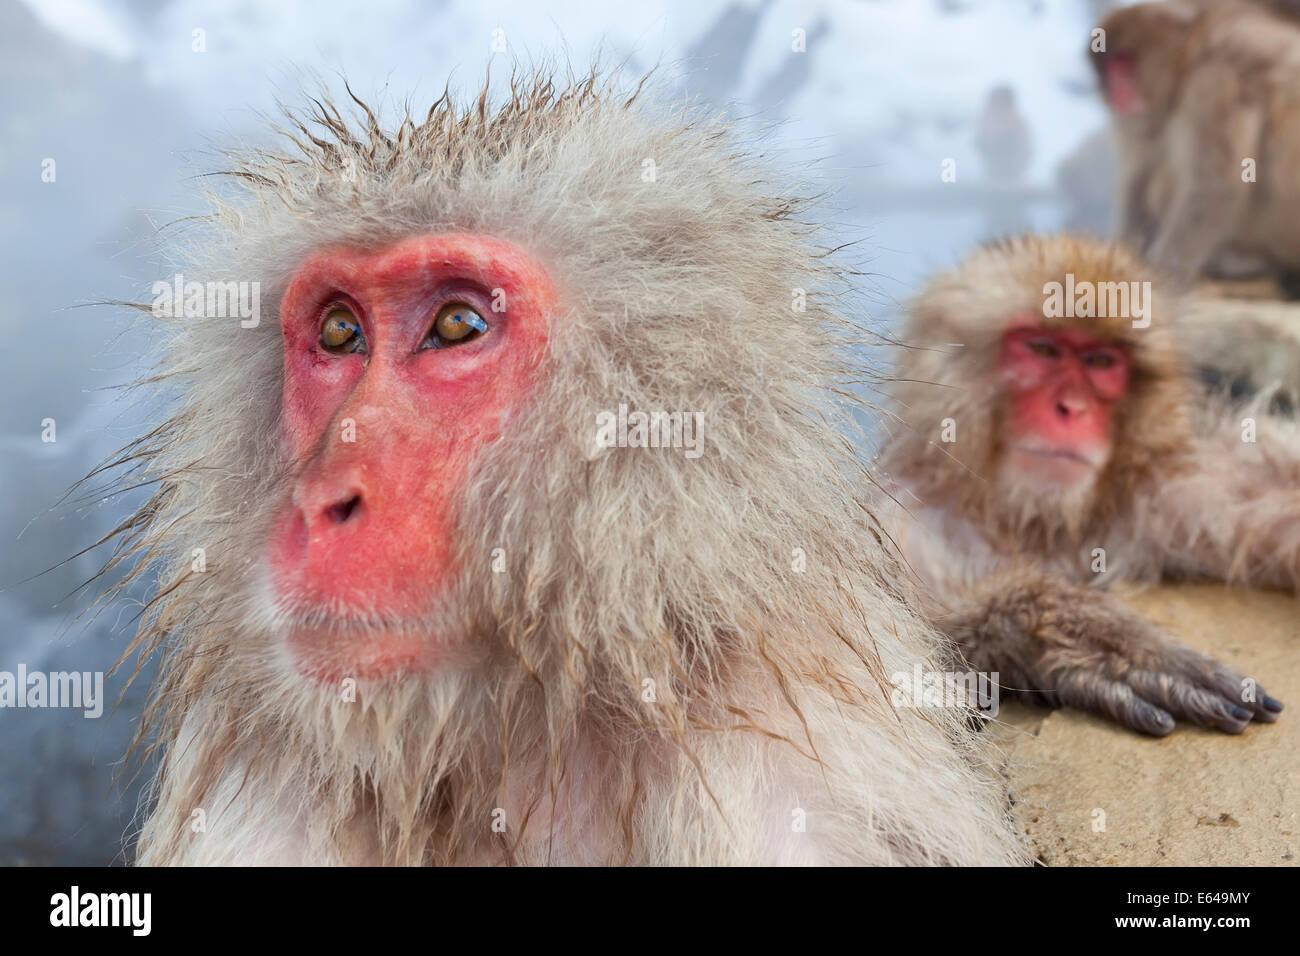 Macaque giapponese (Macaca fuscata)/ Snow monkey, Joshin-etsu National Park, Honshu, Giappone Foto Stock